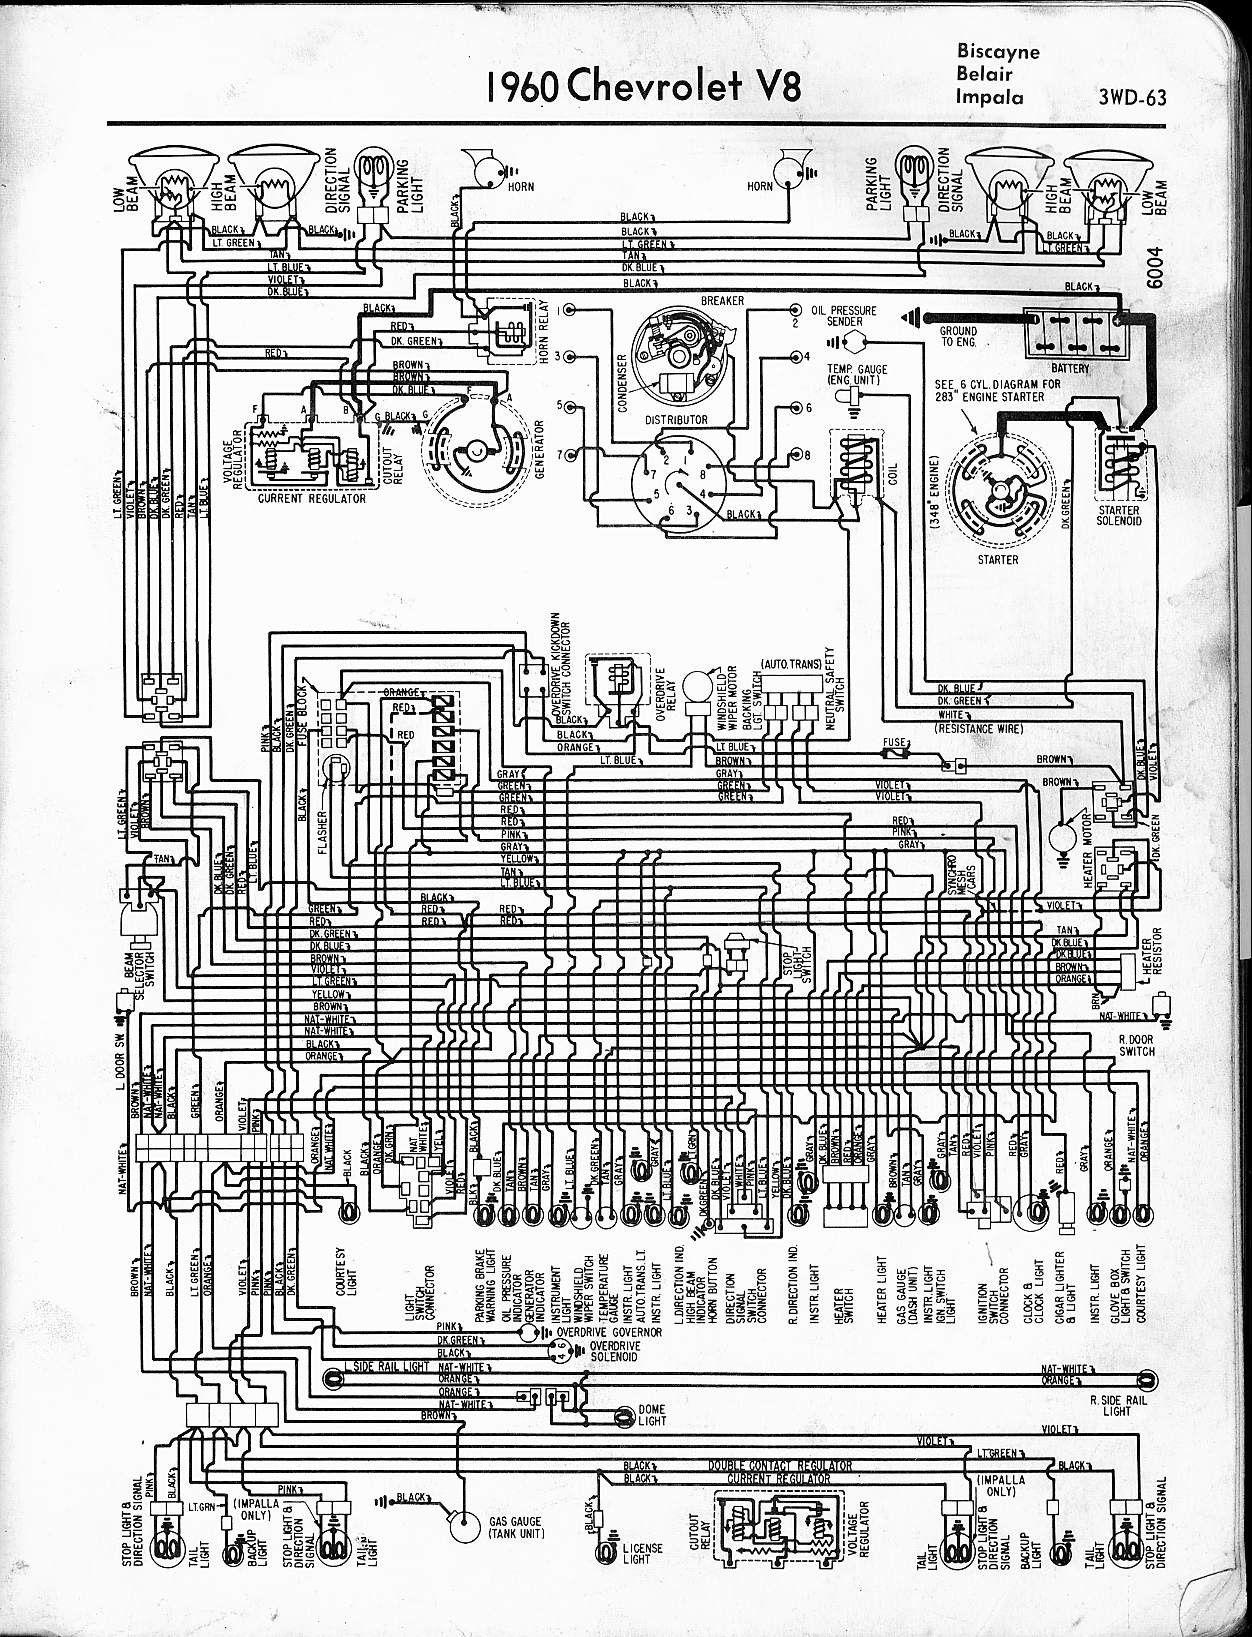 2001 chevy malibu 3 1 engine diagram in 2021   chevy impala, chevy, electrical  wiring diagram  pinterest